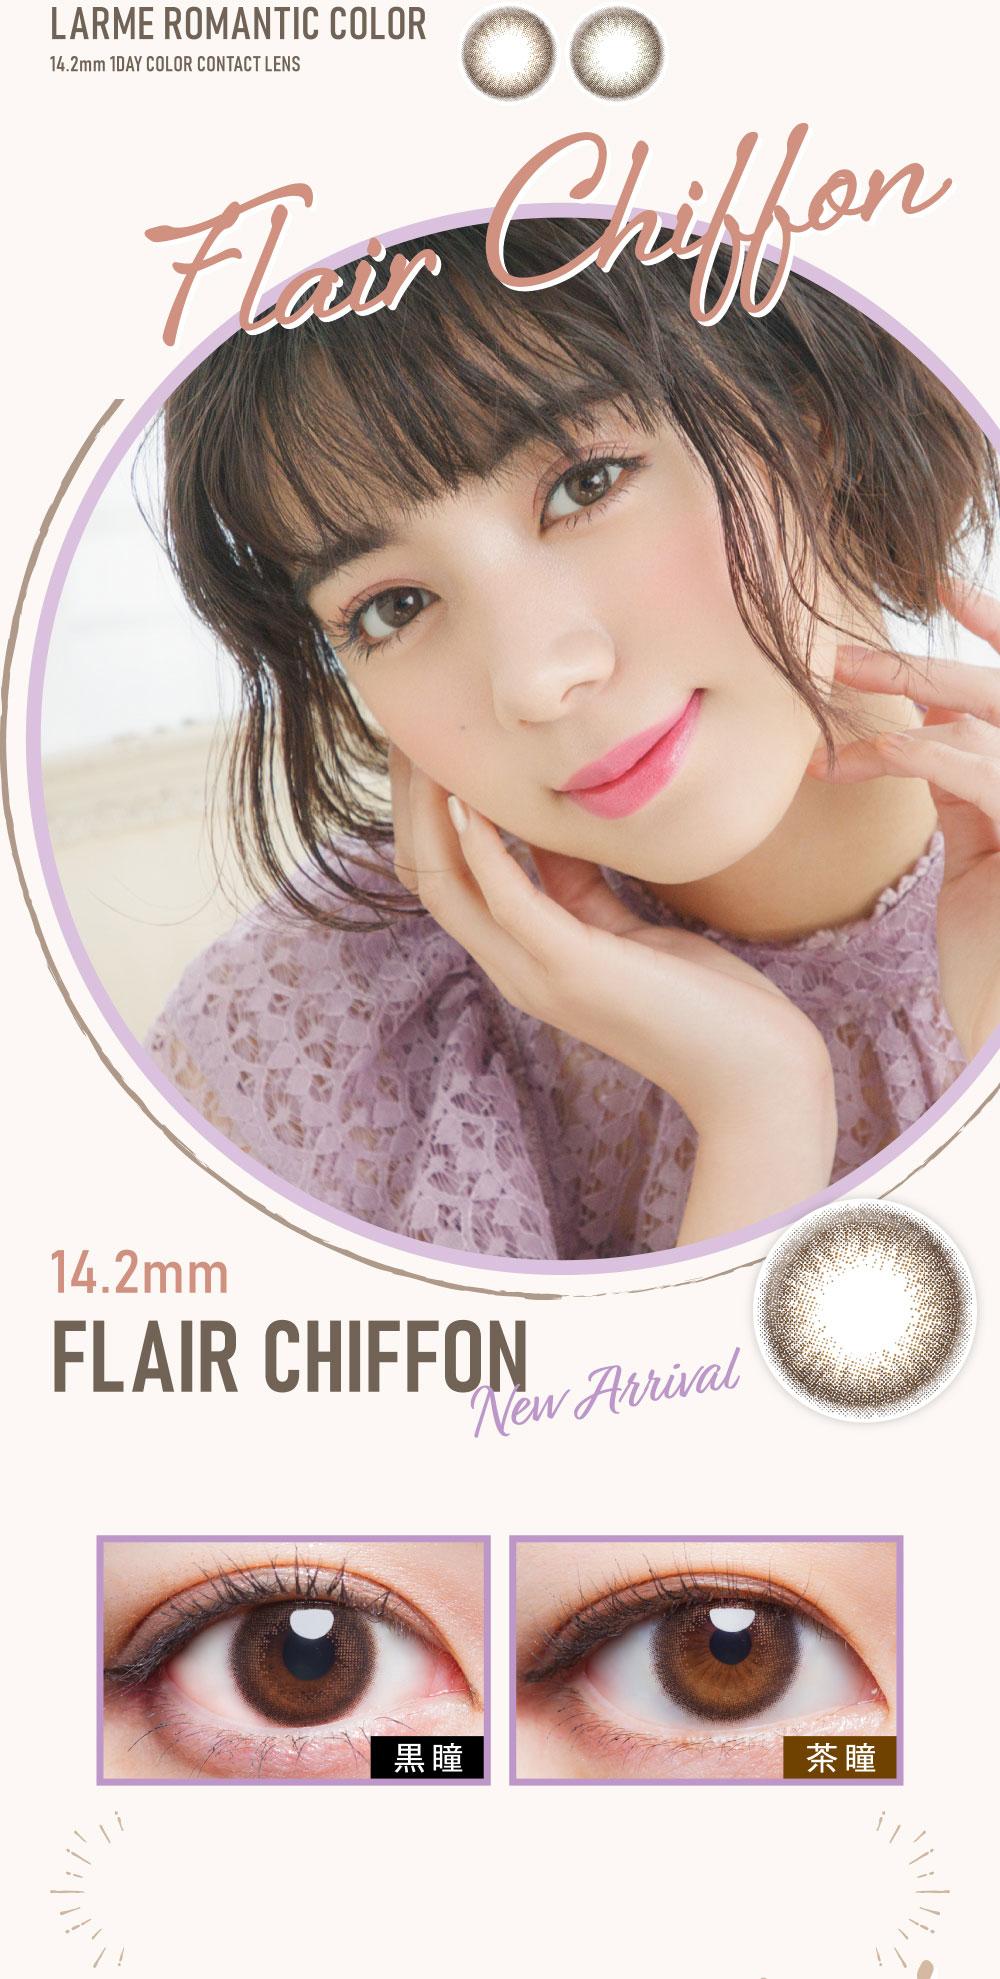 FLAIR CHIFFON